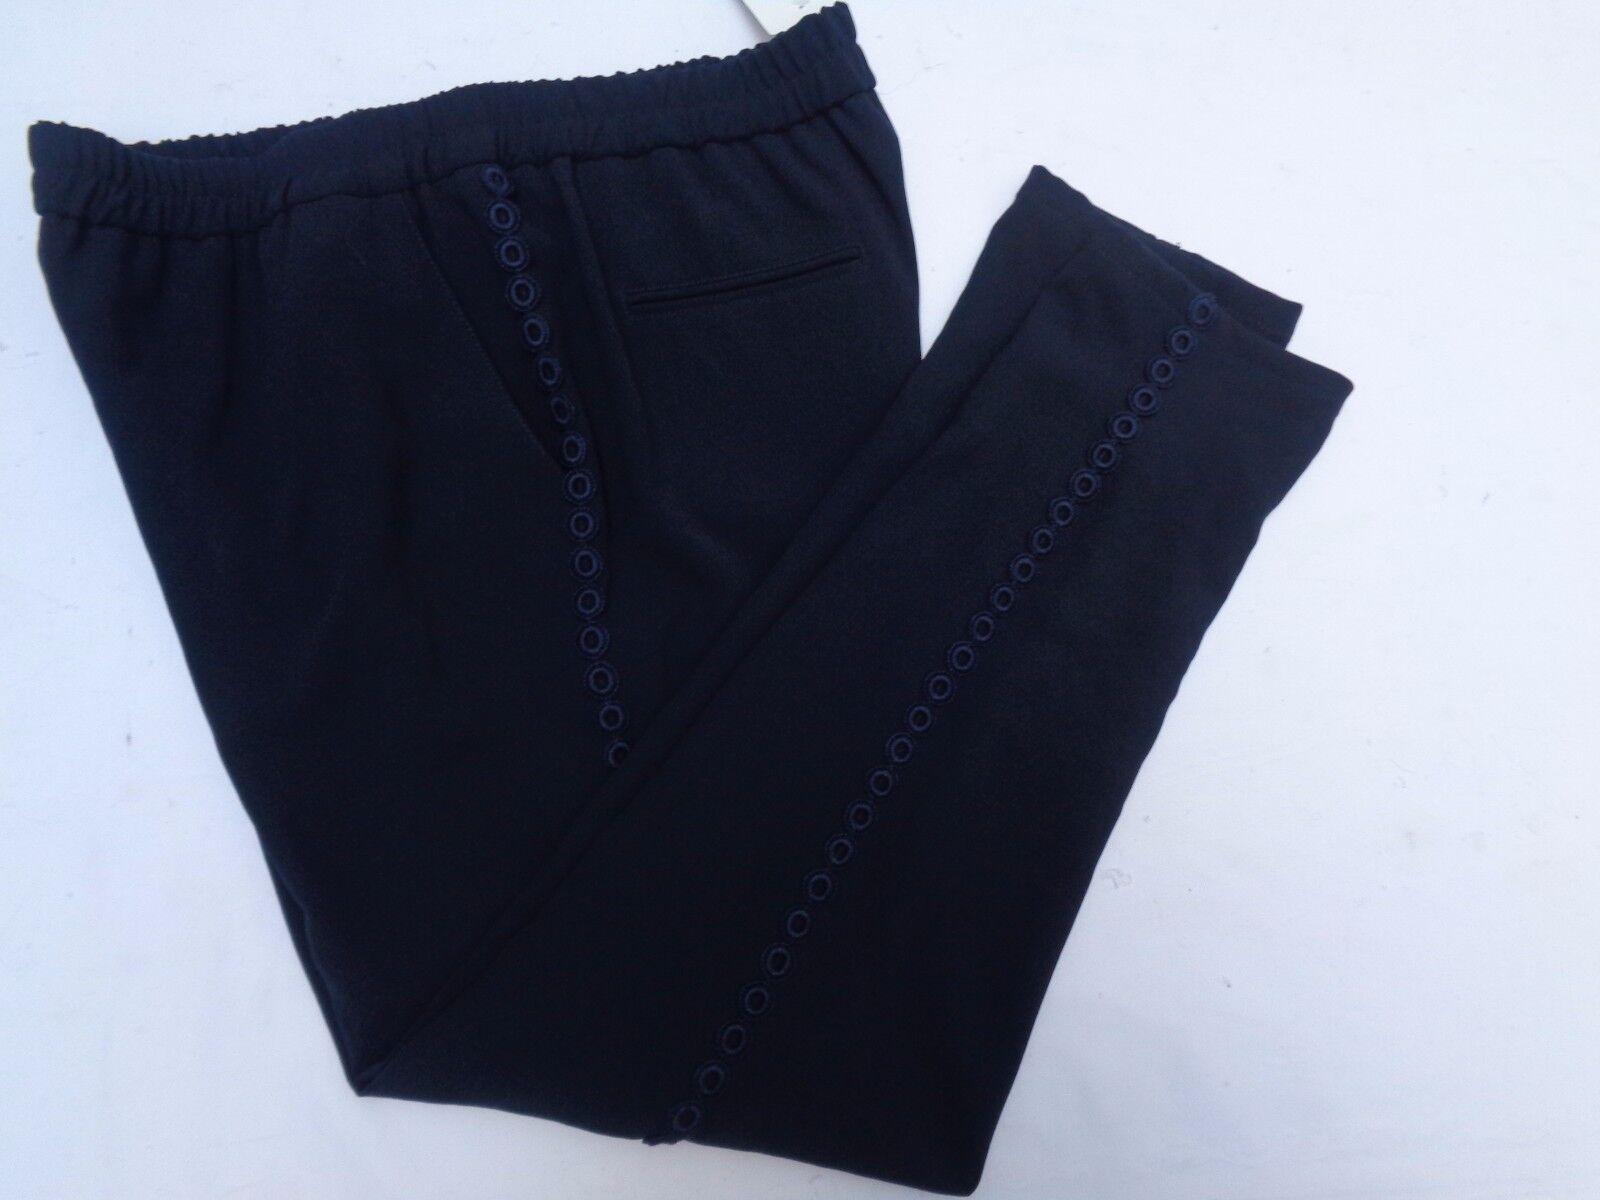 Rene Lezard pantalones señora tamaño 42 azul con  borde de tela flores de arriba a abajo  ahorra hasta un 80%